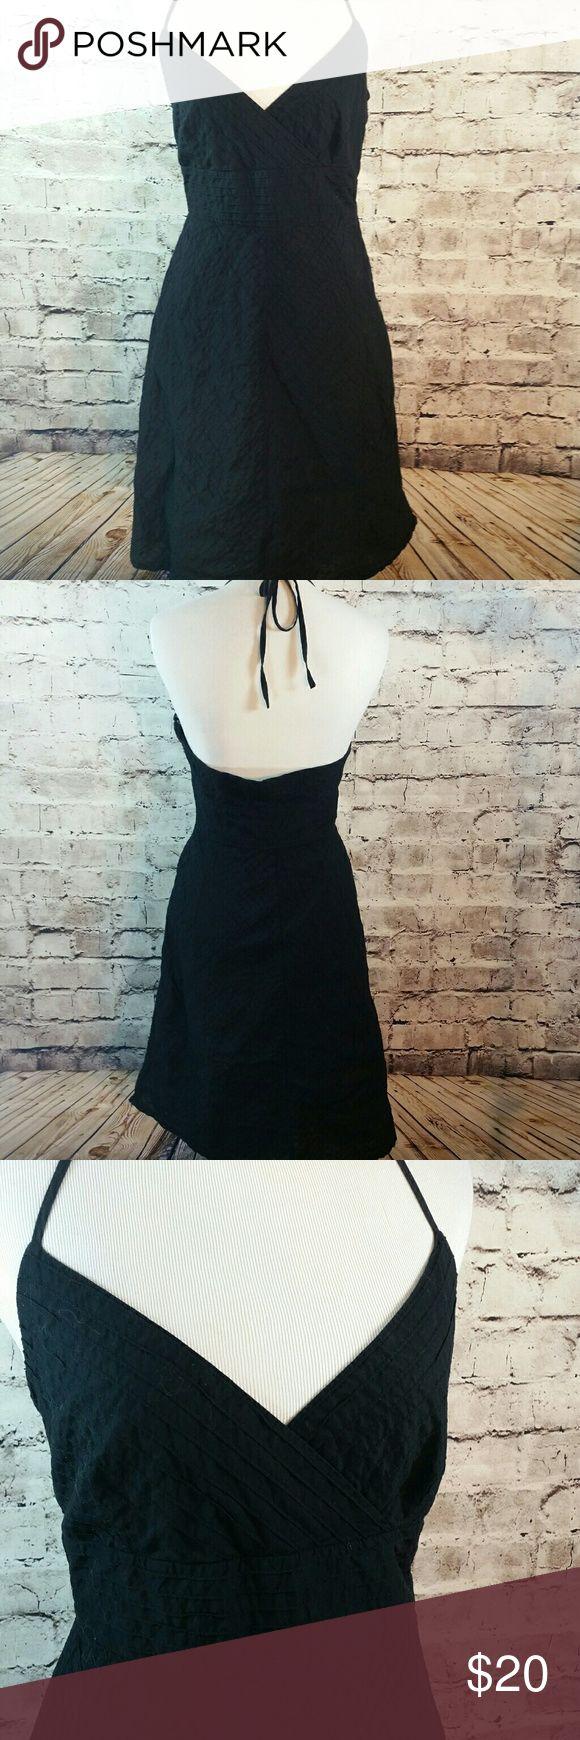 Vtg Gap black cotton tie halter sundress Vtg Gap black cotton tie halter sundress..tiny sewn pleats great texture GAP Dresses Backless